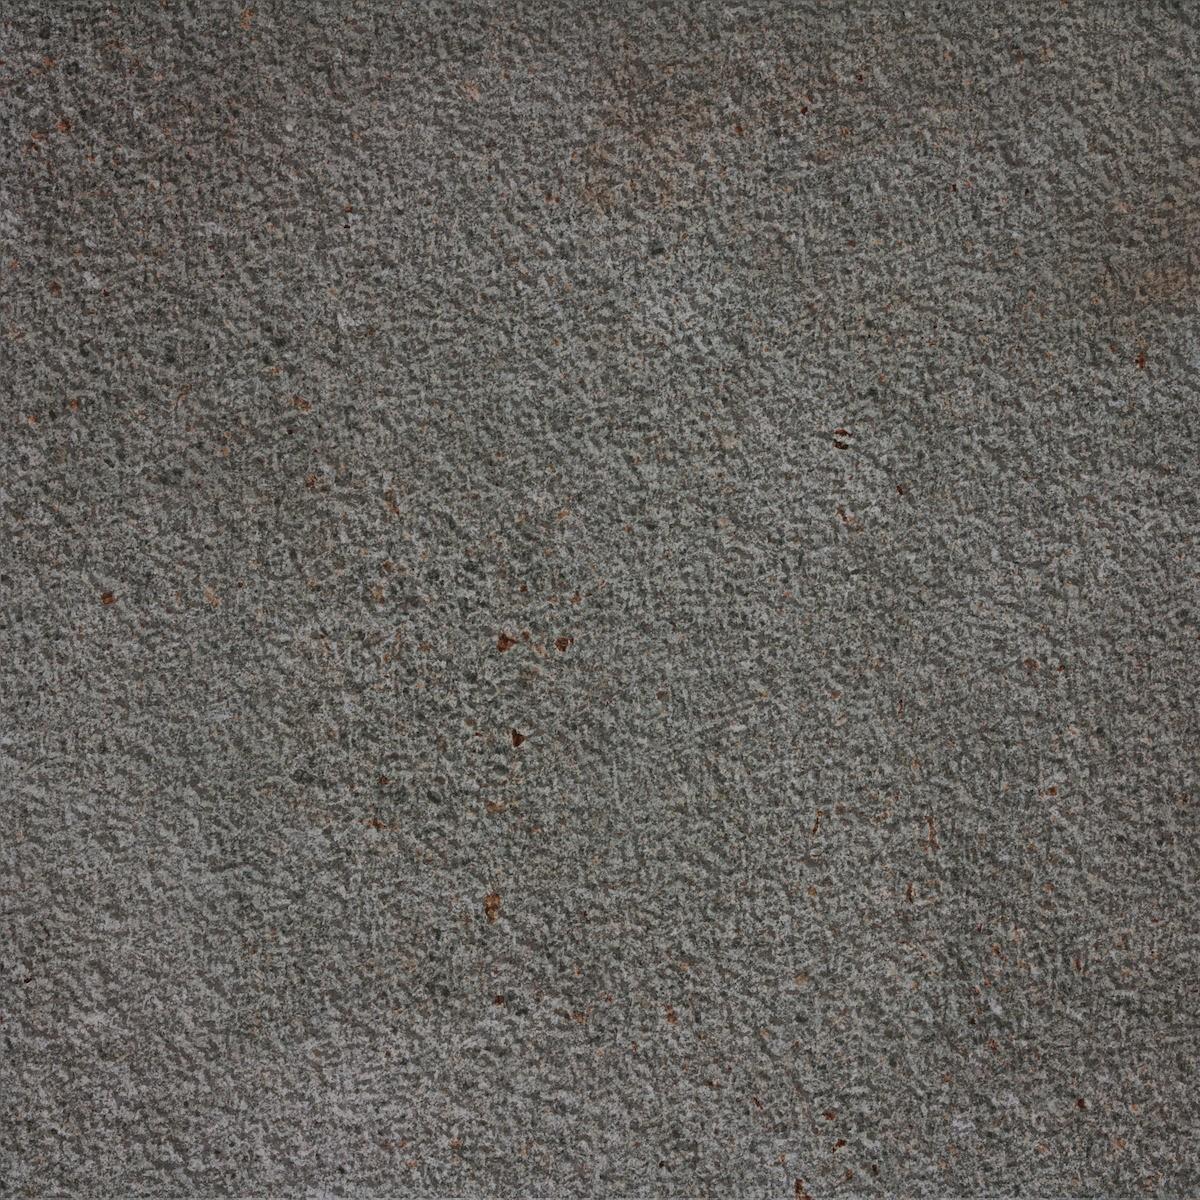 Dlažba Rako Piazzetta čierna 60x60 cm mat DAR66789.1